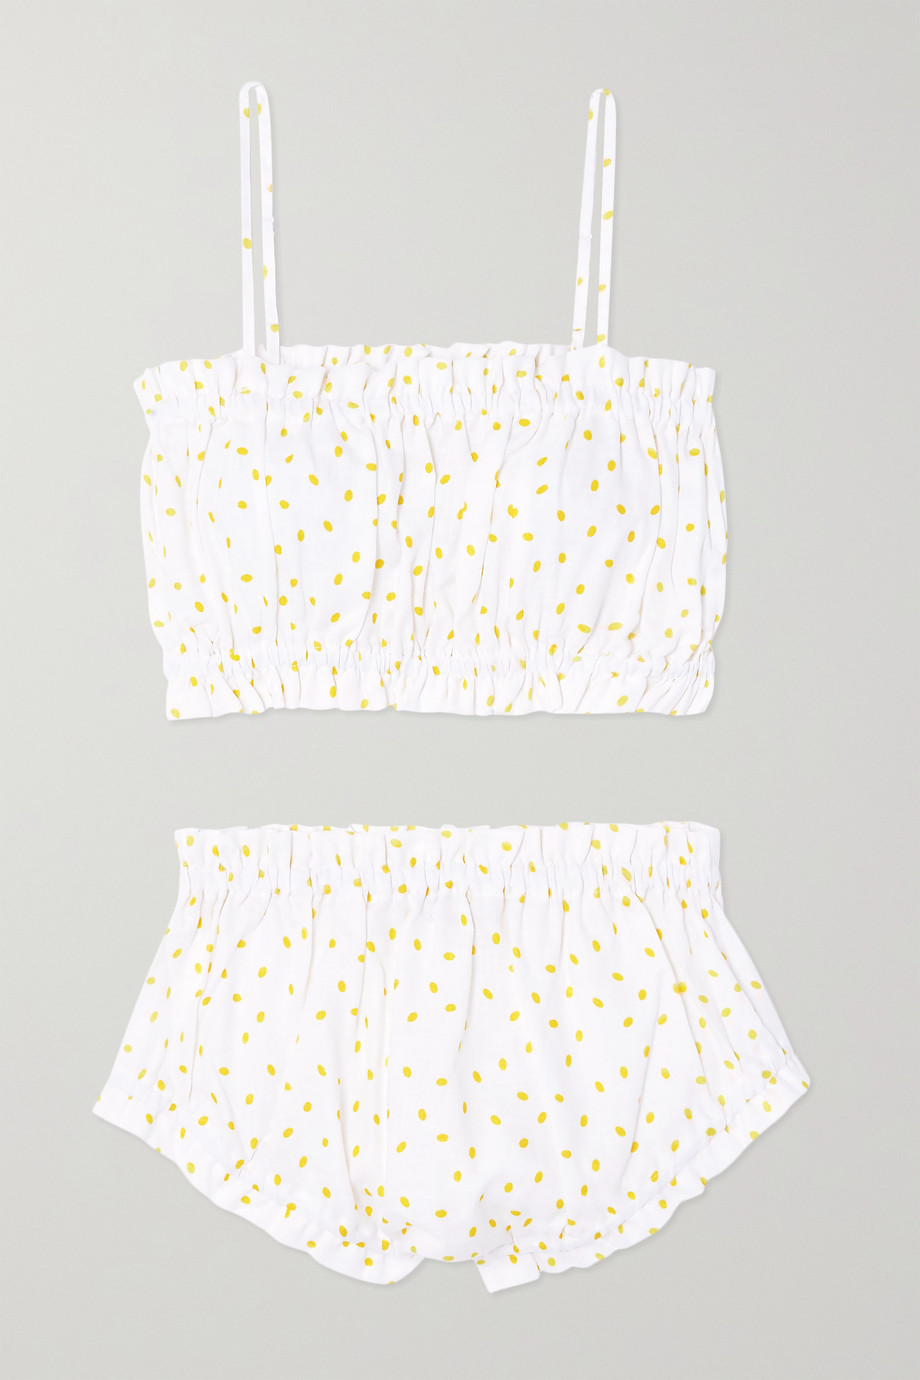 Maison Essentiele Rose gathered printed linen pajama set